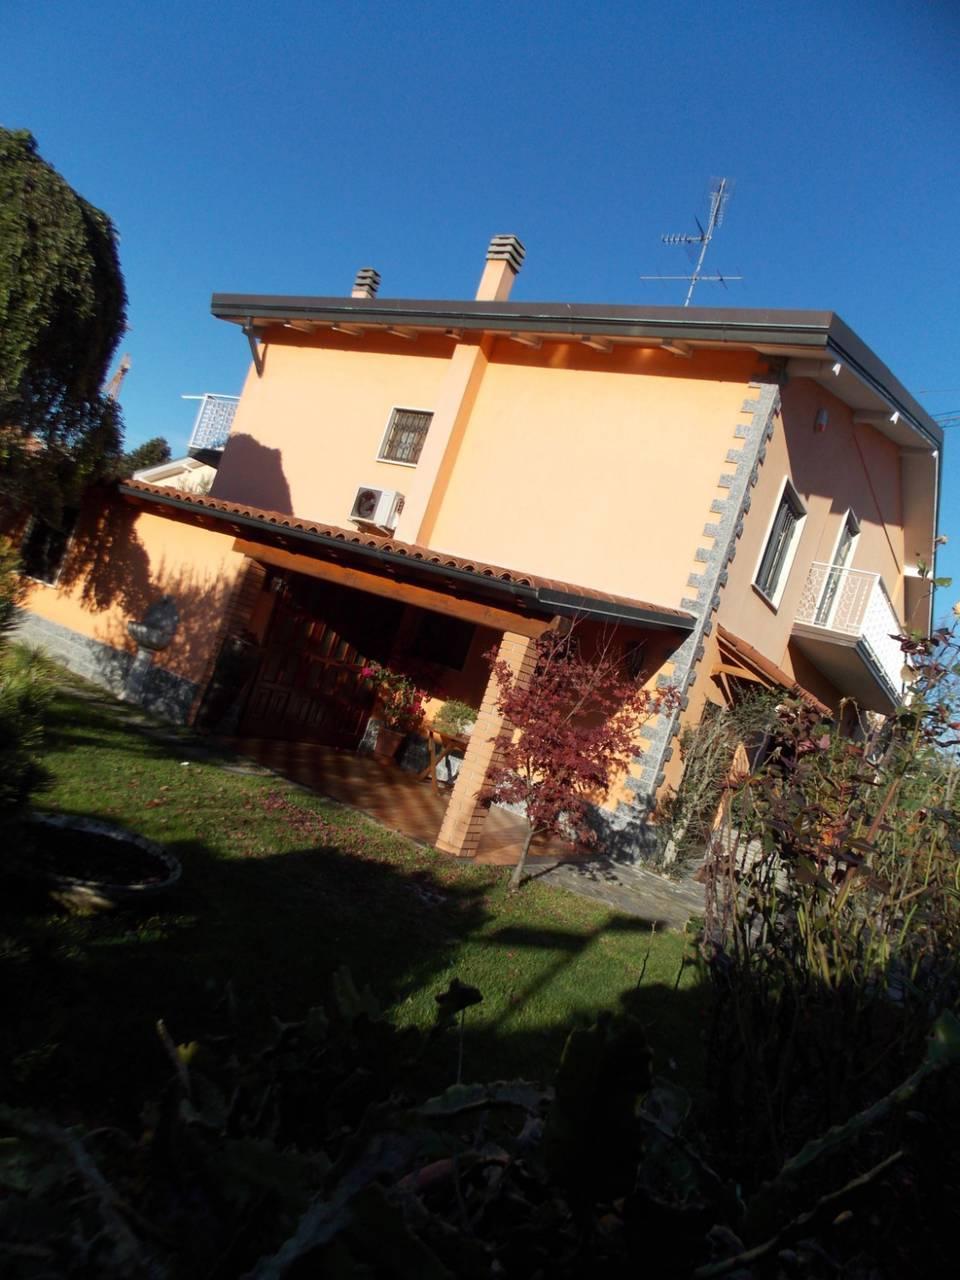 Villa-a-San-Giuliano-Milanese-in-Sesto-Ulteriano-6